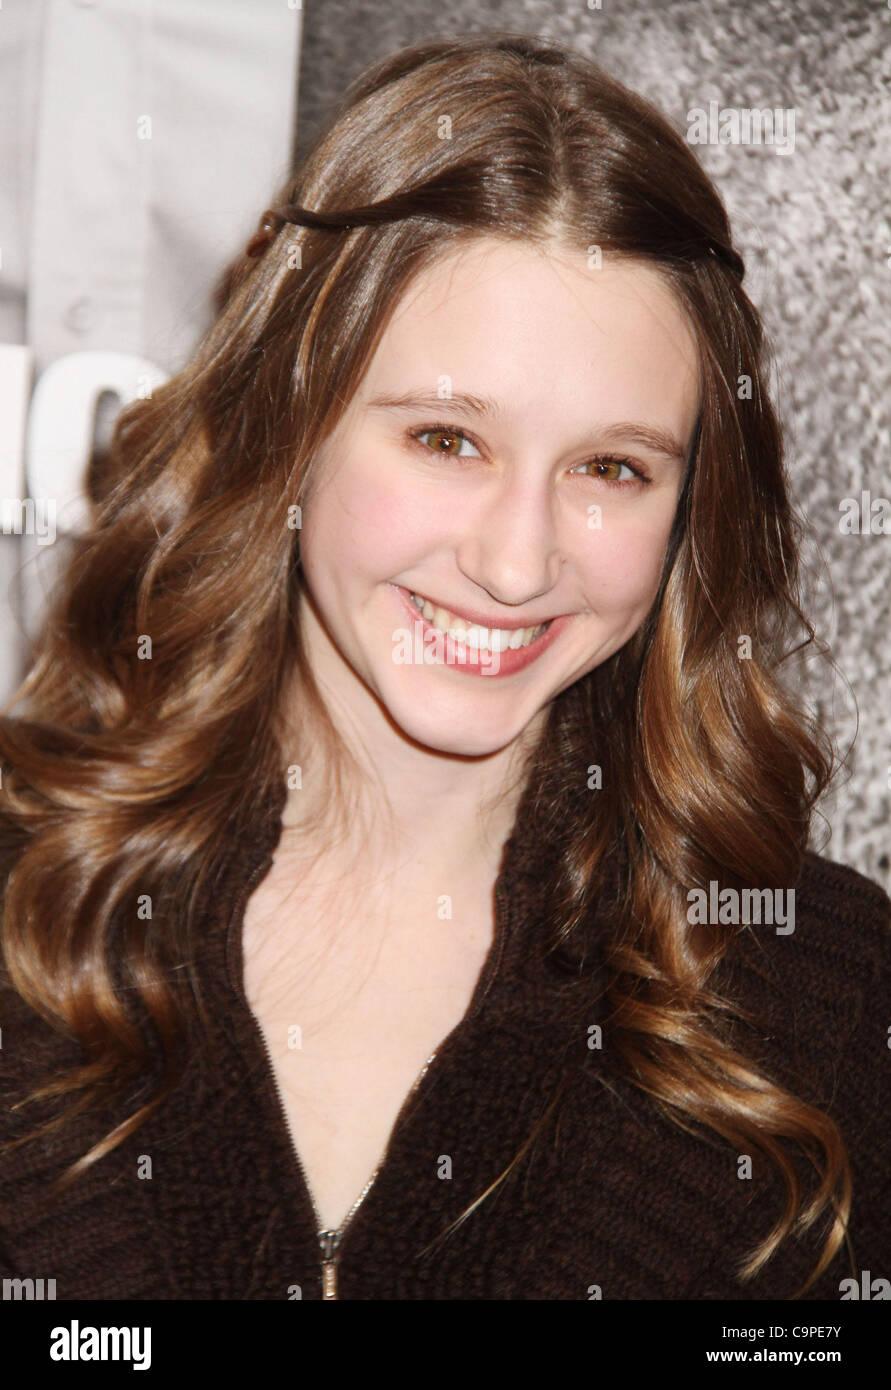 Feb. 7, 2012 - New York, New York, U.S. - Actresses TAISSA FARMIGA attends the New York premiere of 'Safe House' - Stock Image